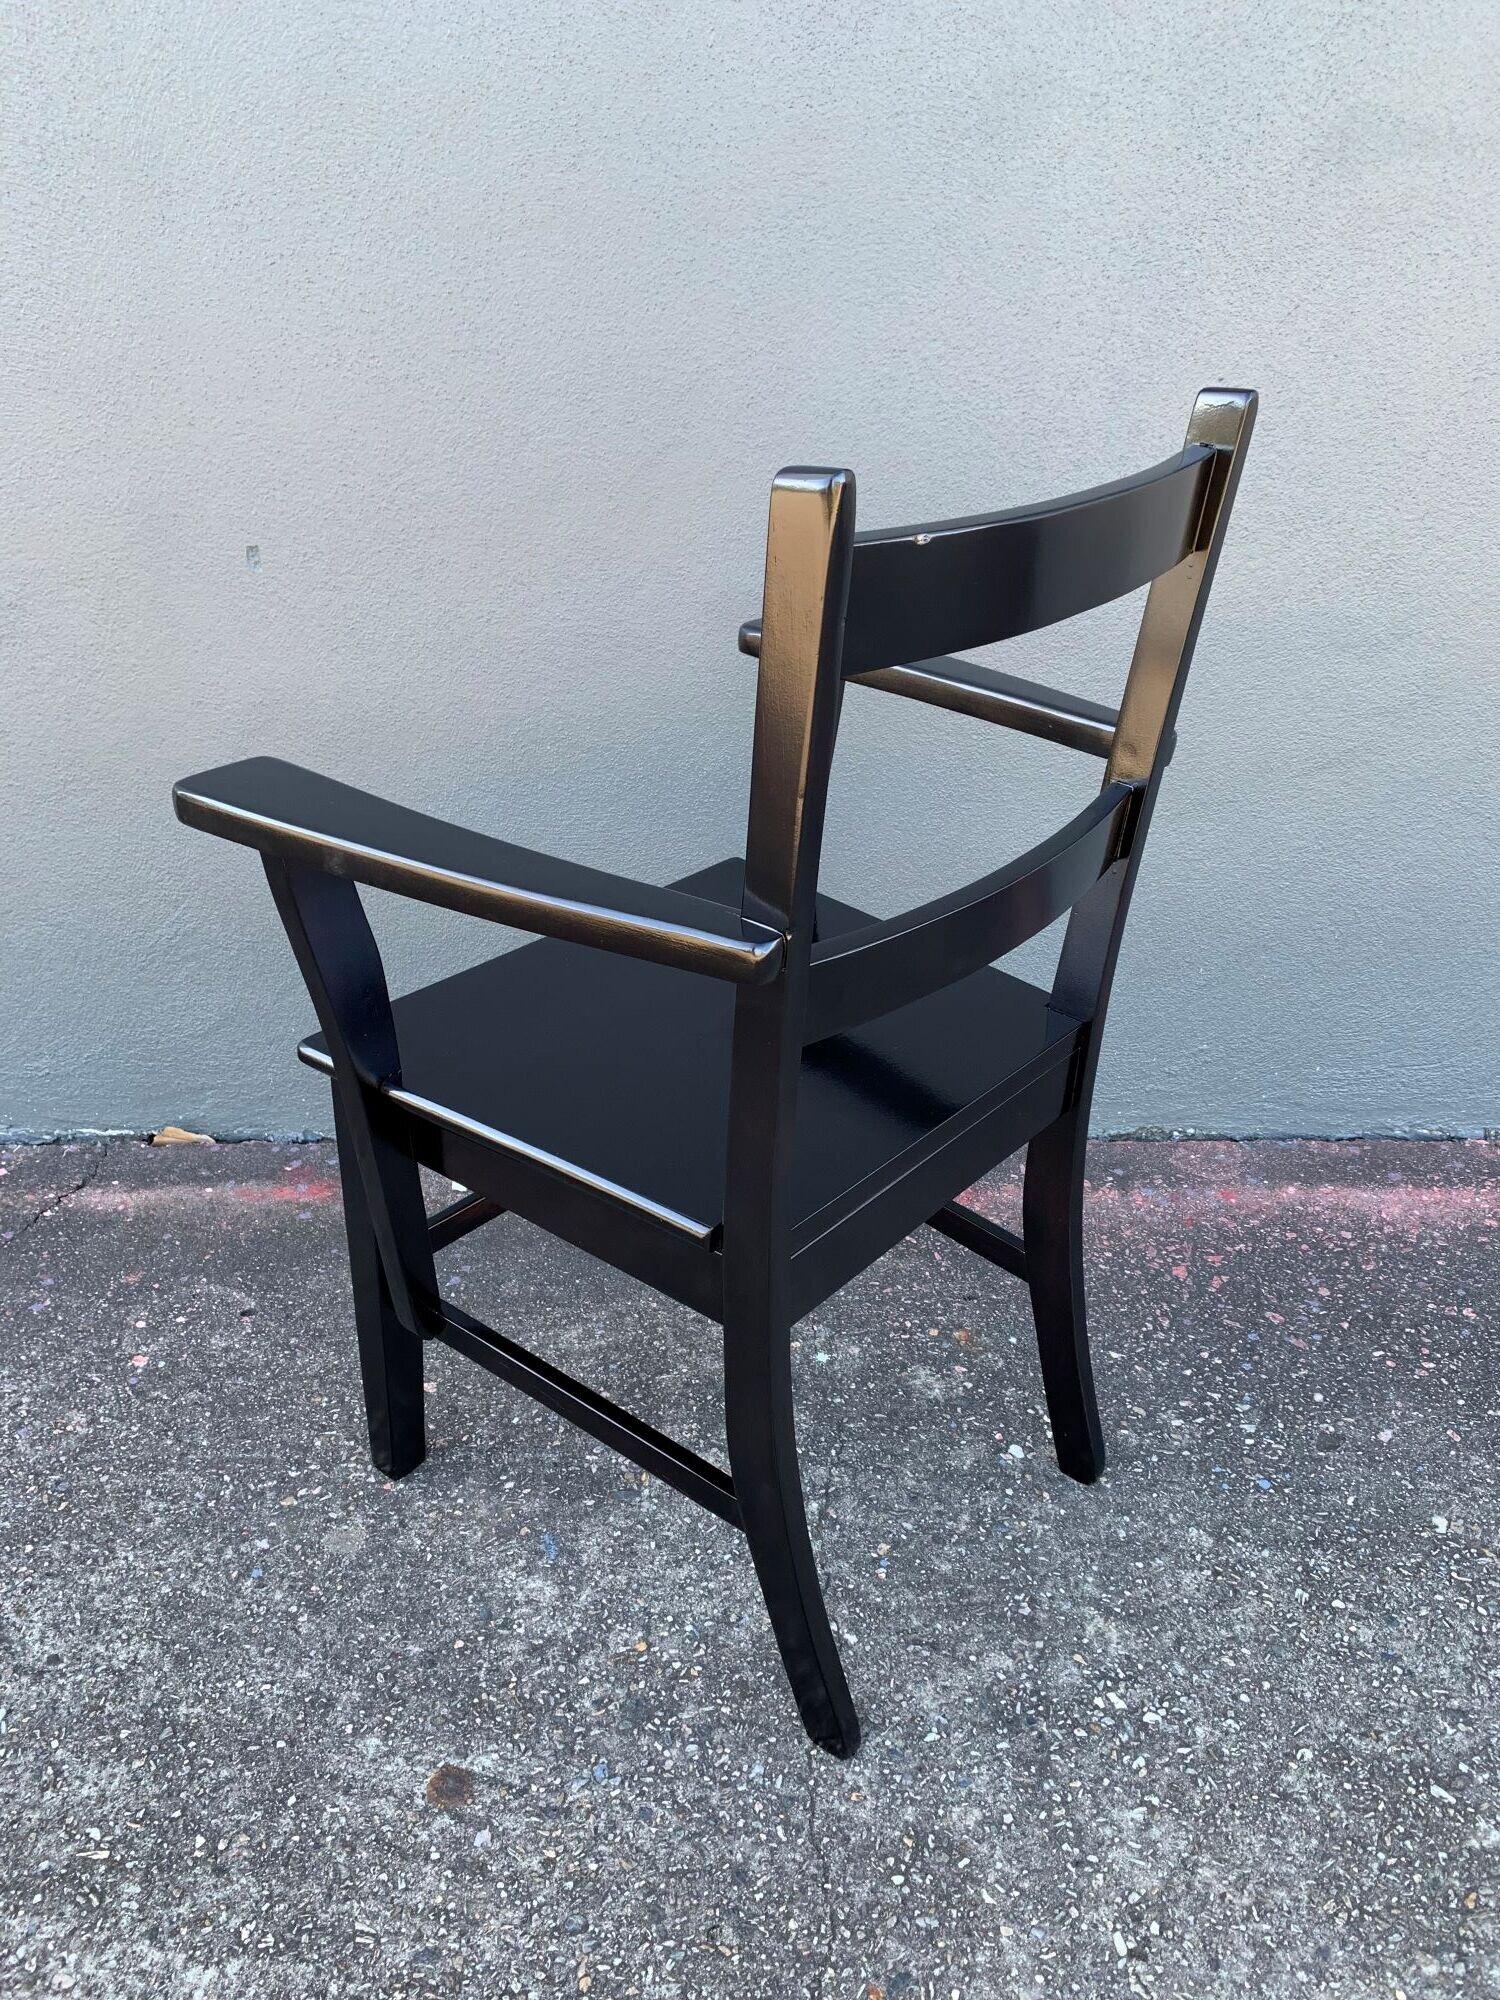 chair after restoration bywater design.jpg